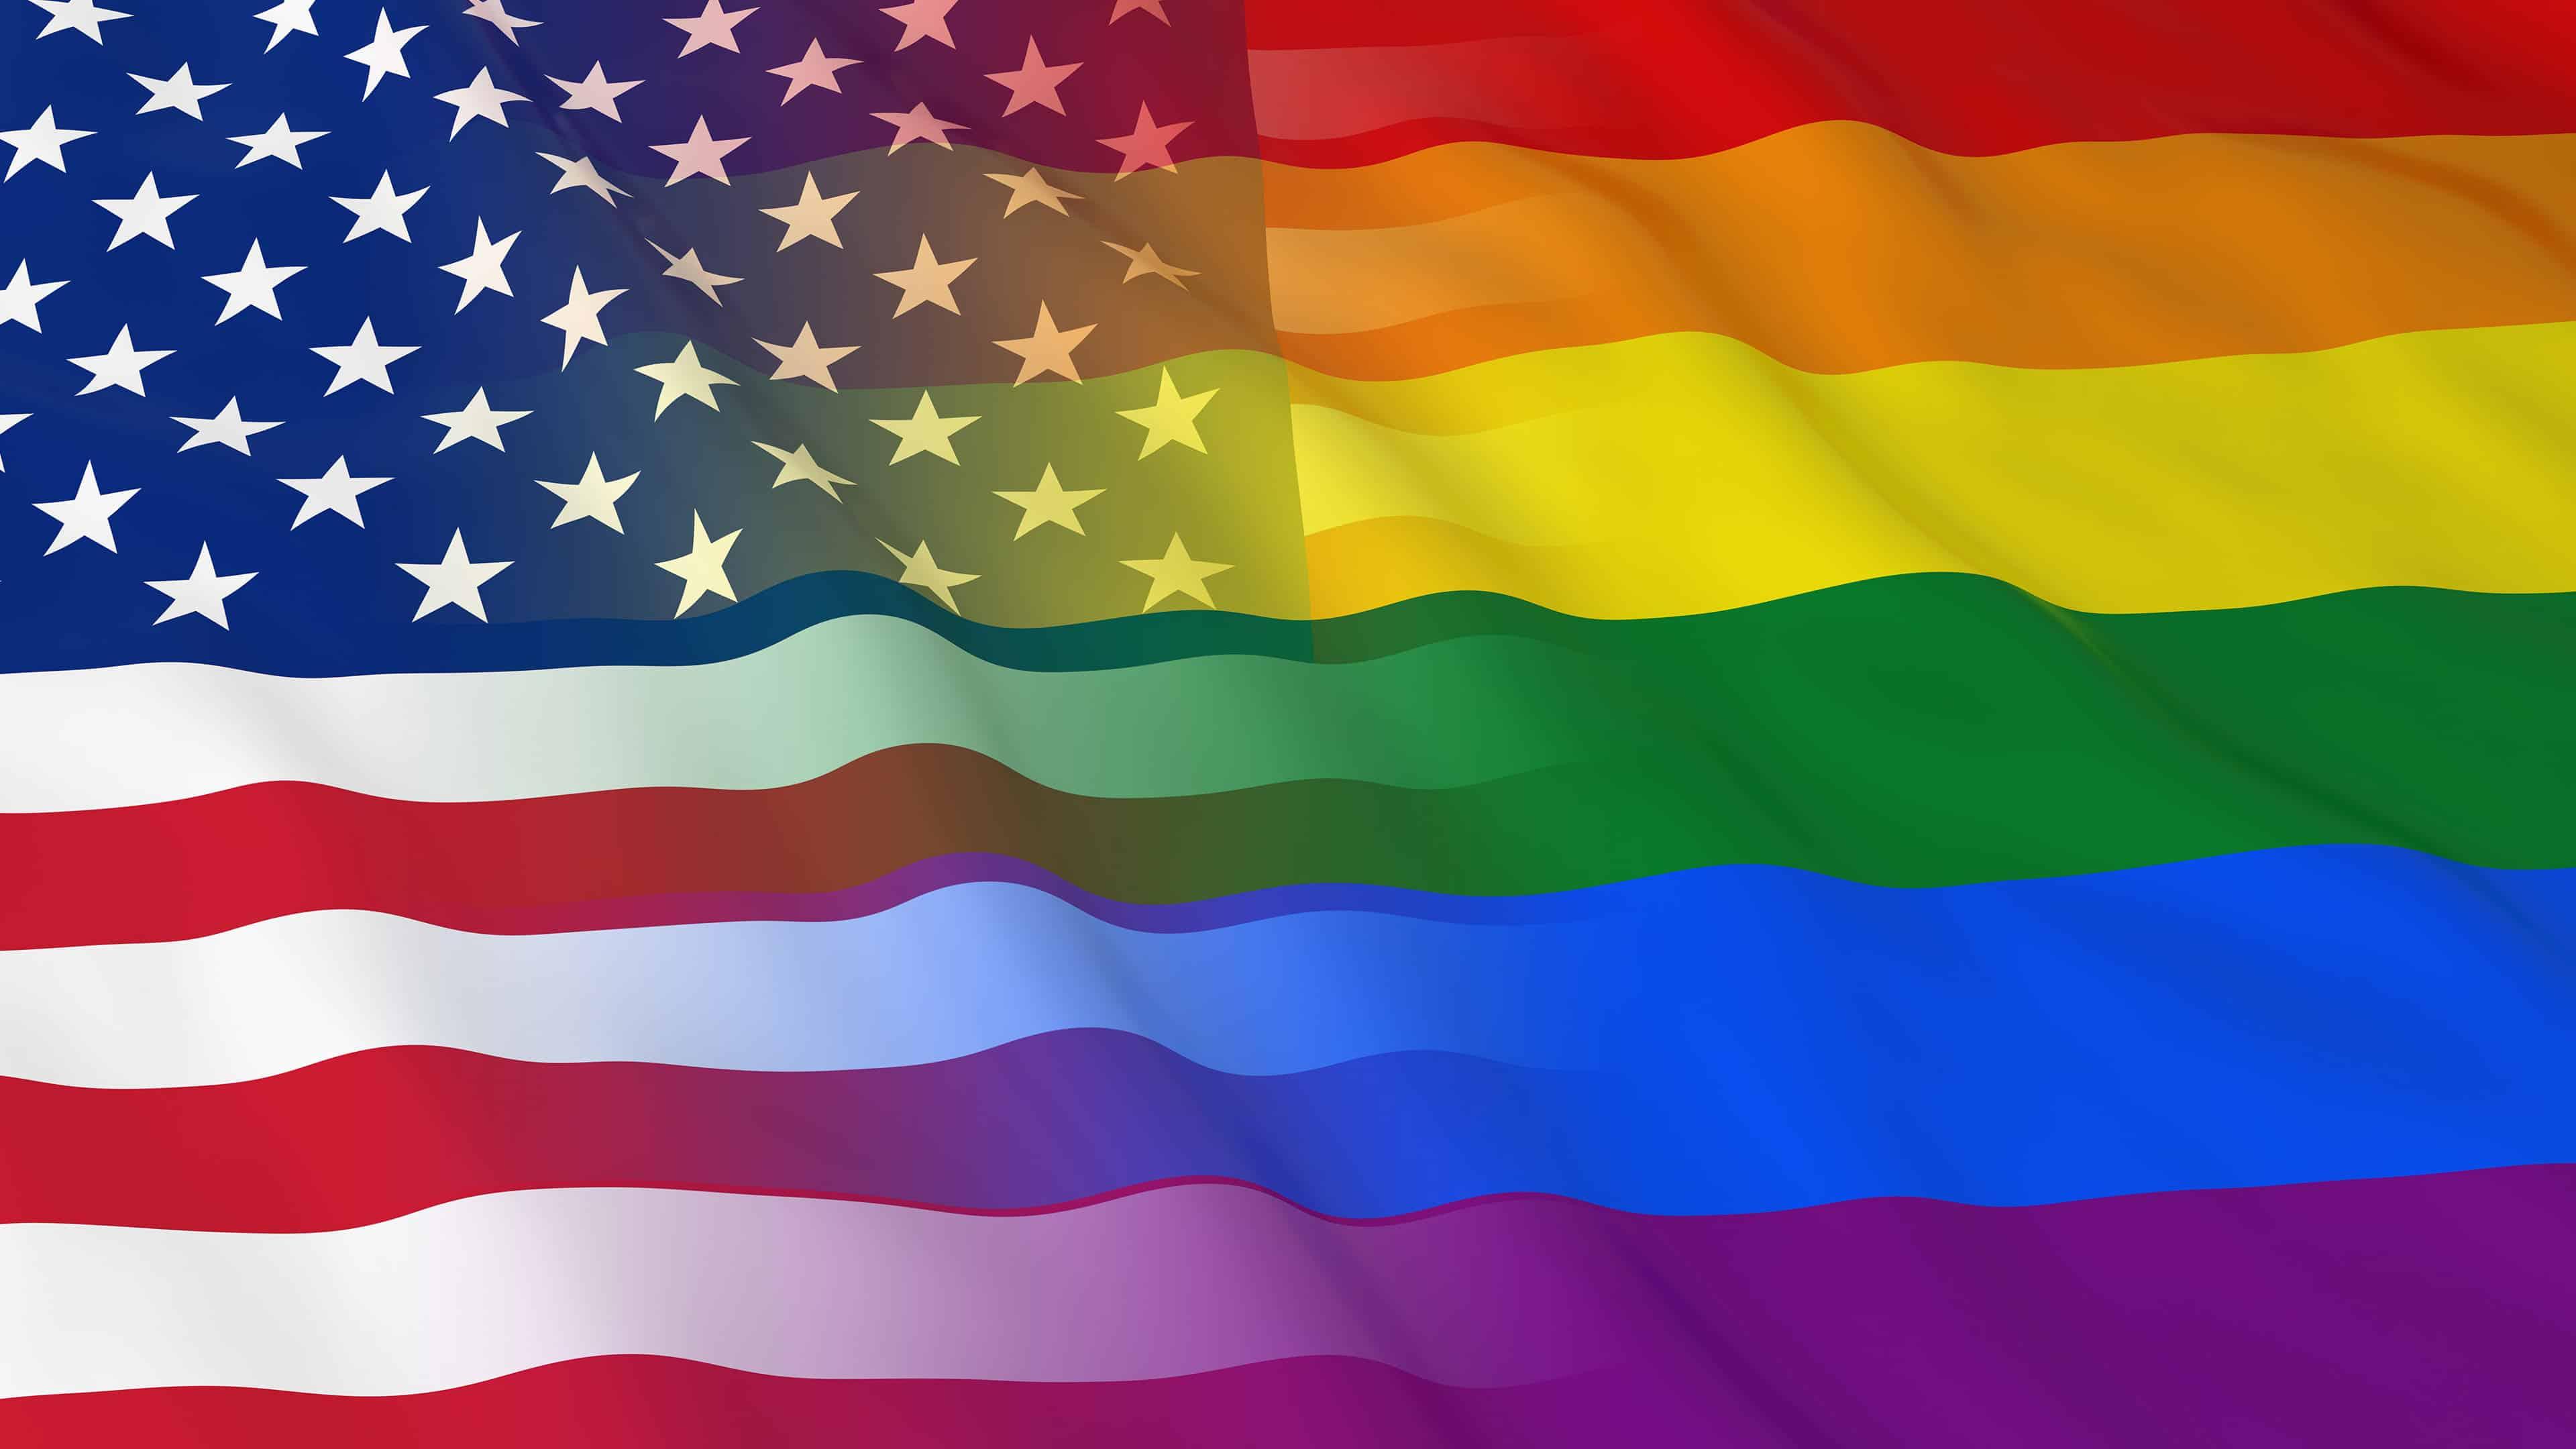 American And Lgbt Flag Uhd 4k Wallpaper - Pride Flag American Flag , HD Wallpaper & Backgrounds